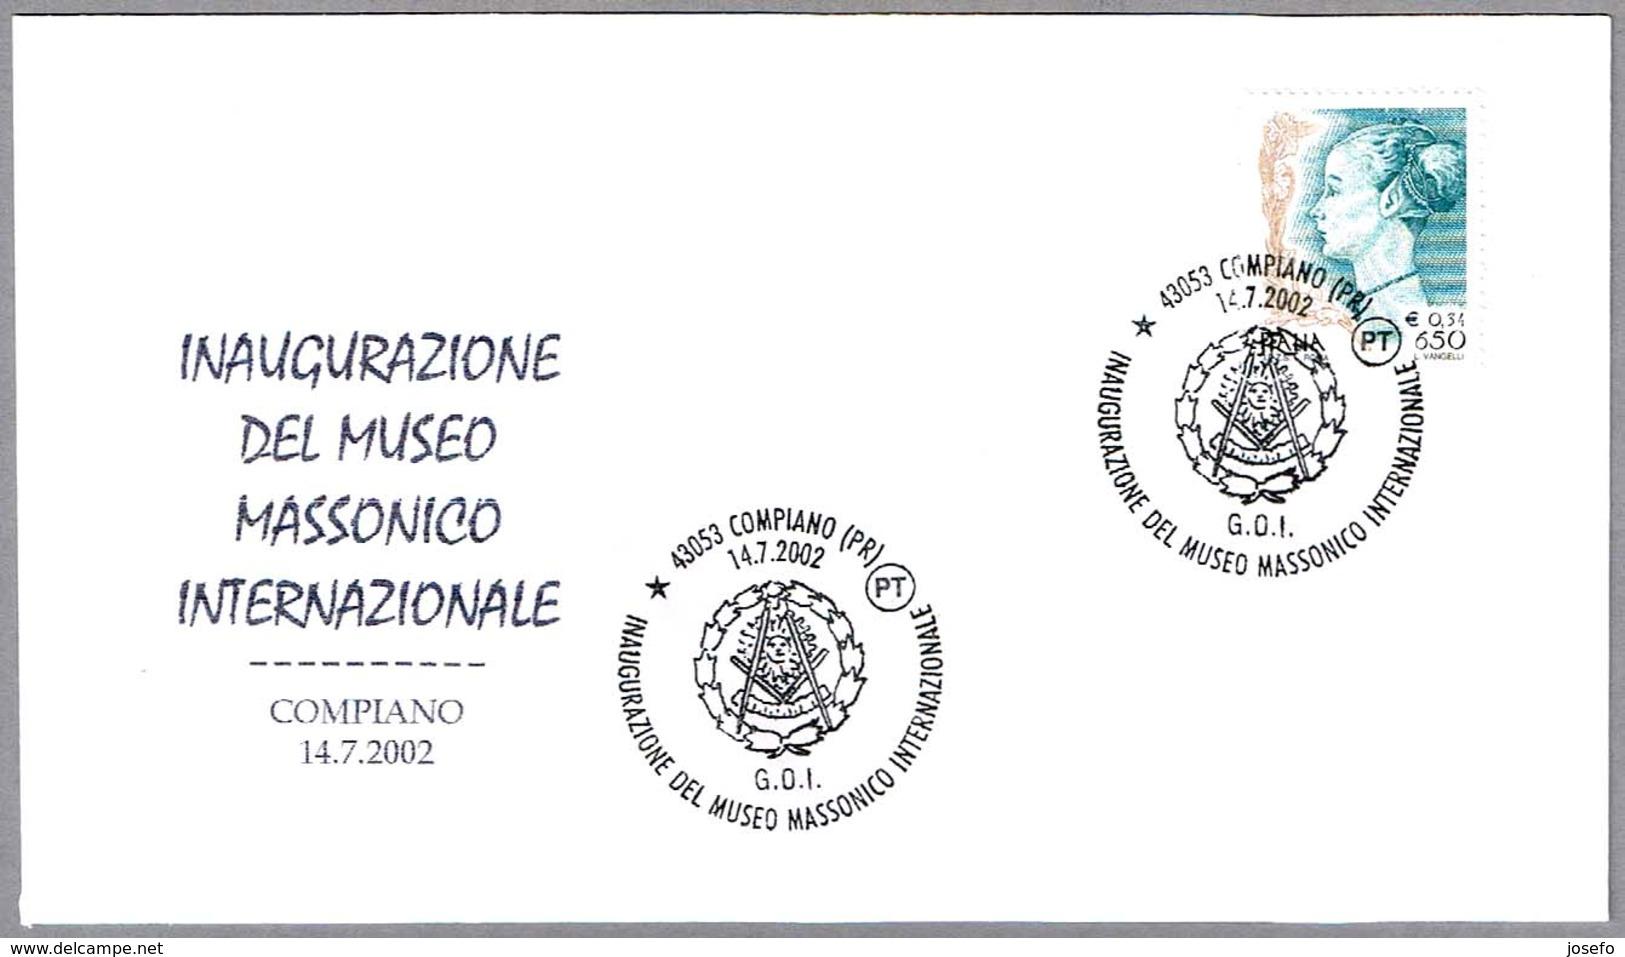 INAUGURACION MUSEO MASONICO INTERNACIONAL - Masonic Museum. Compiano 2002 - Francmasonería